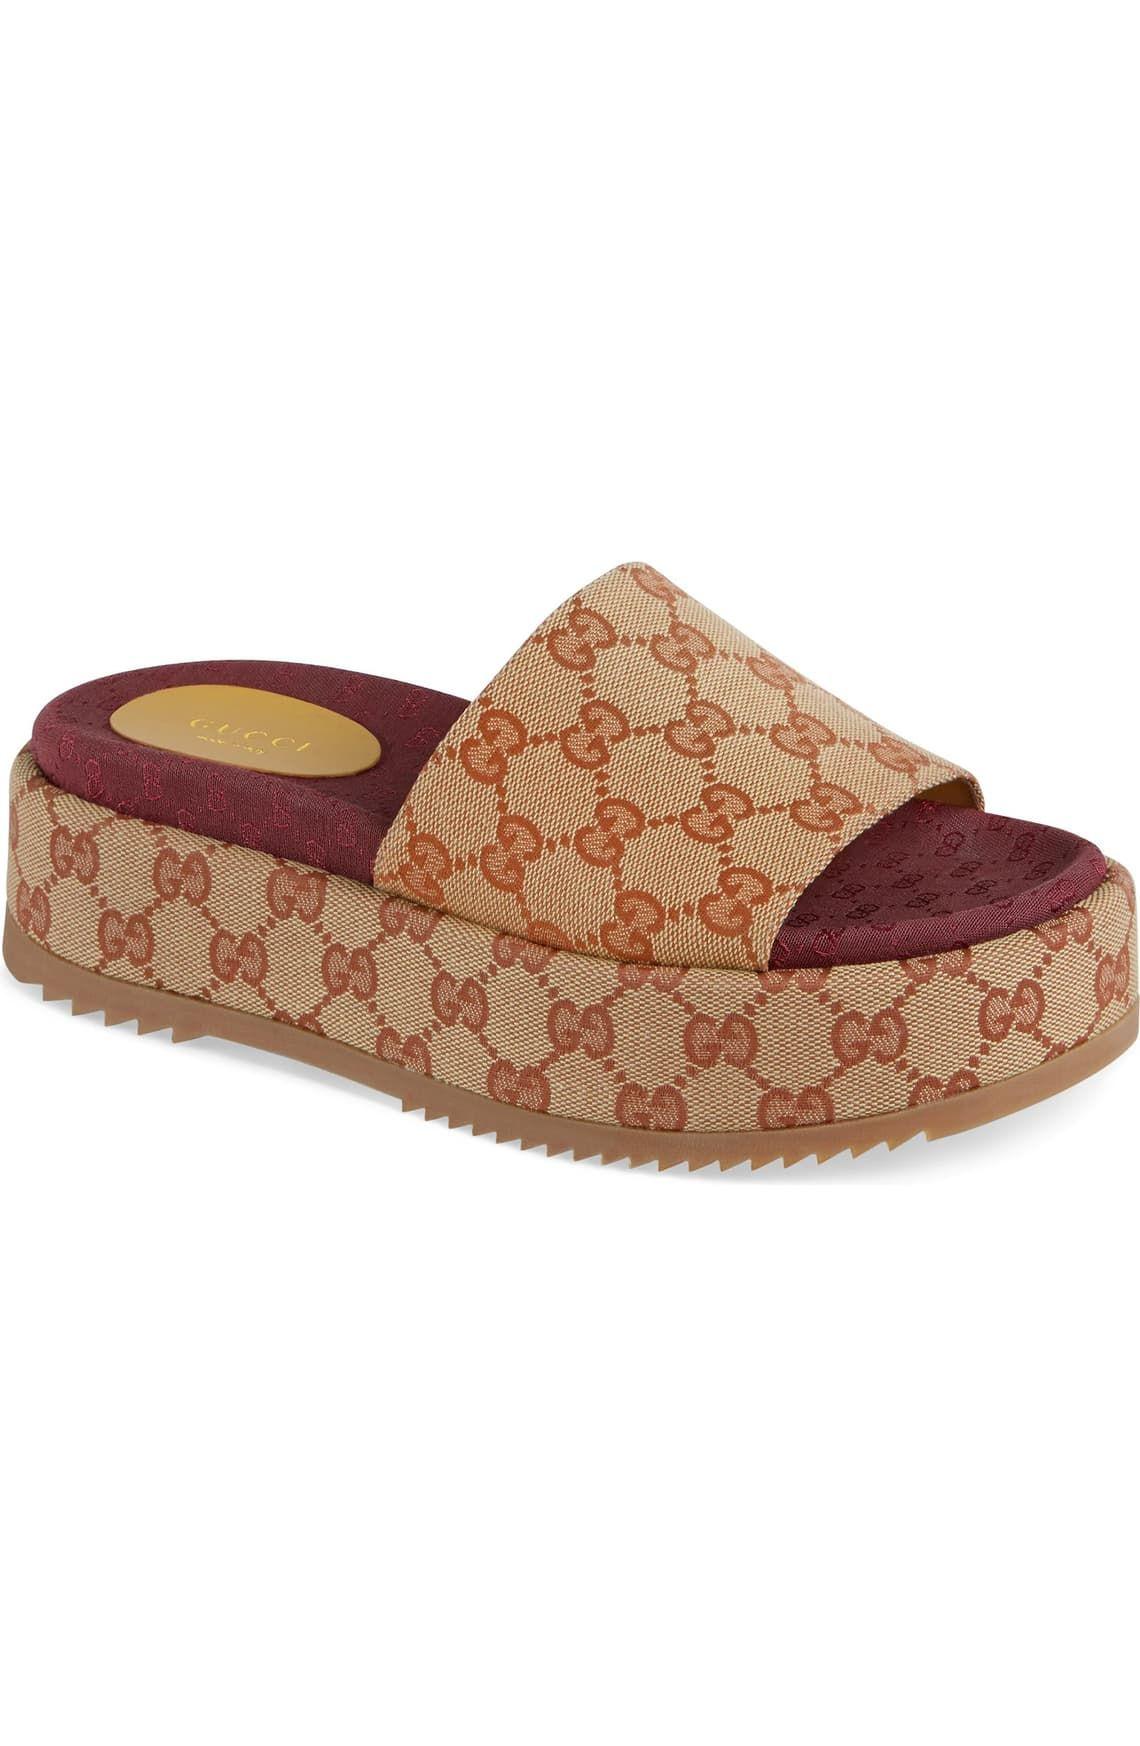 Gucci Angelina GG Supreme Platform Slide Sandal (Women